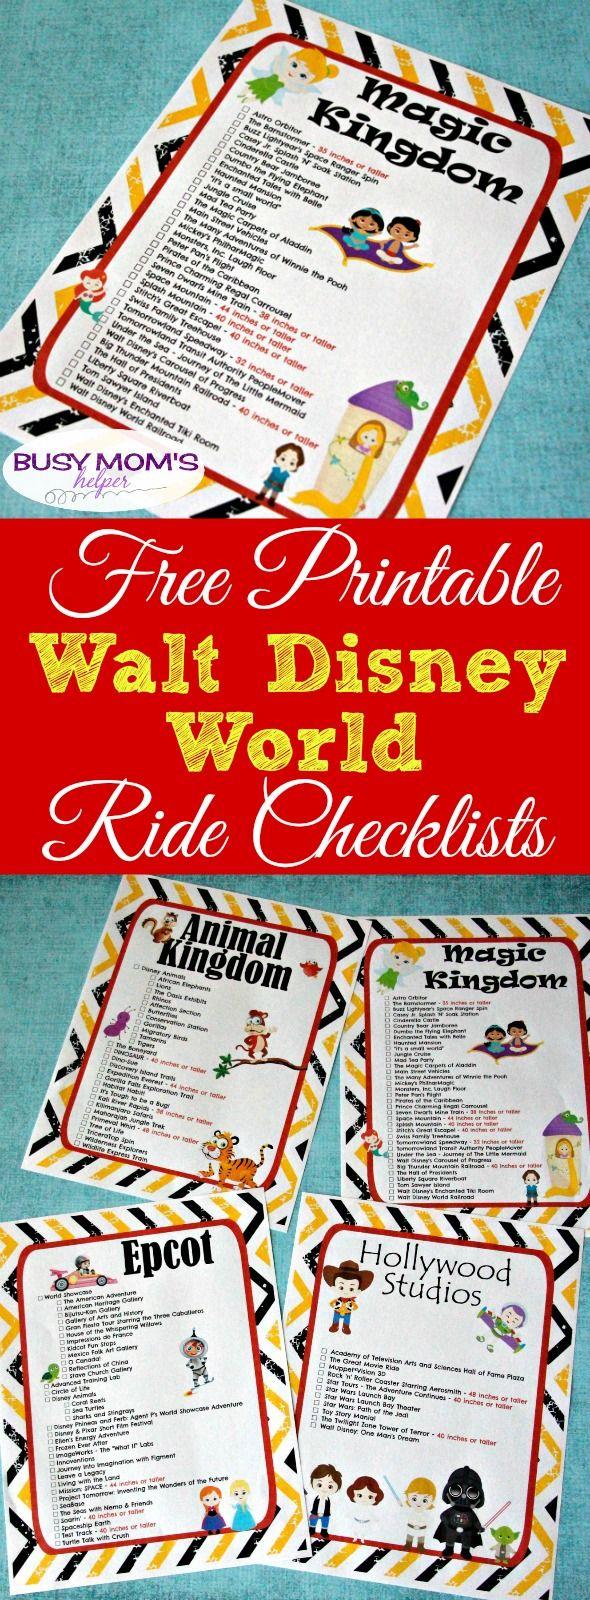 Free Printable Walt Disney World Ride Checklists | Walt with Printable List Of Rides At Disney World 2020 Checklist